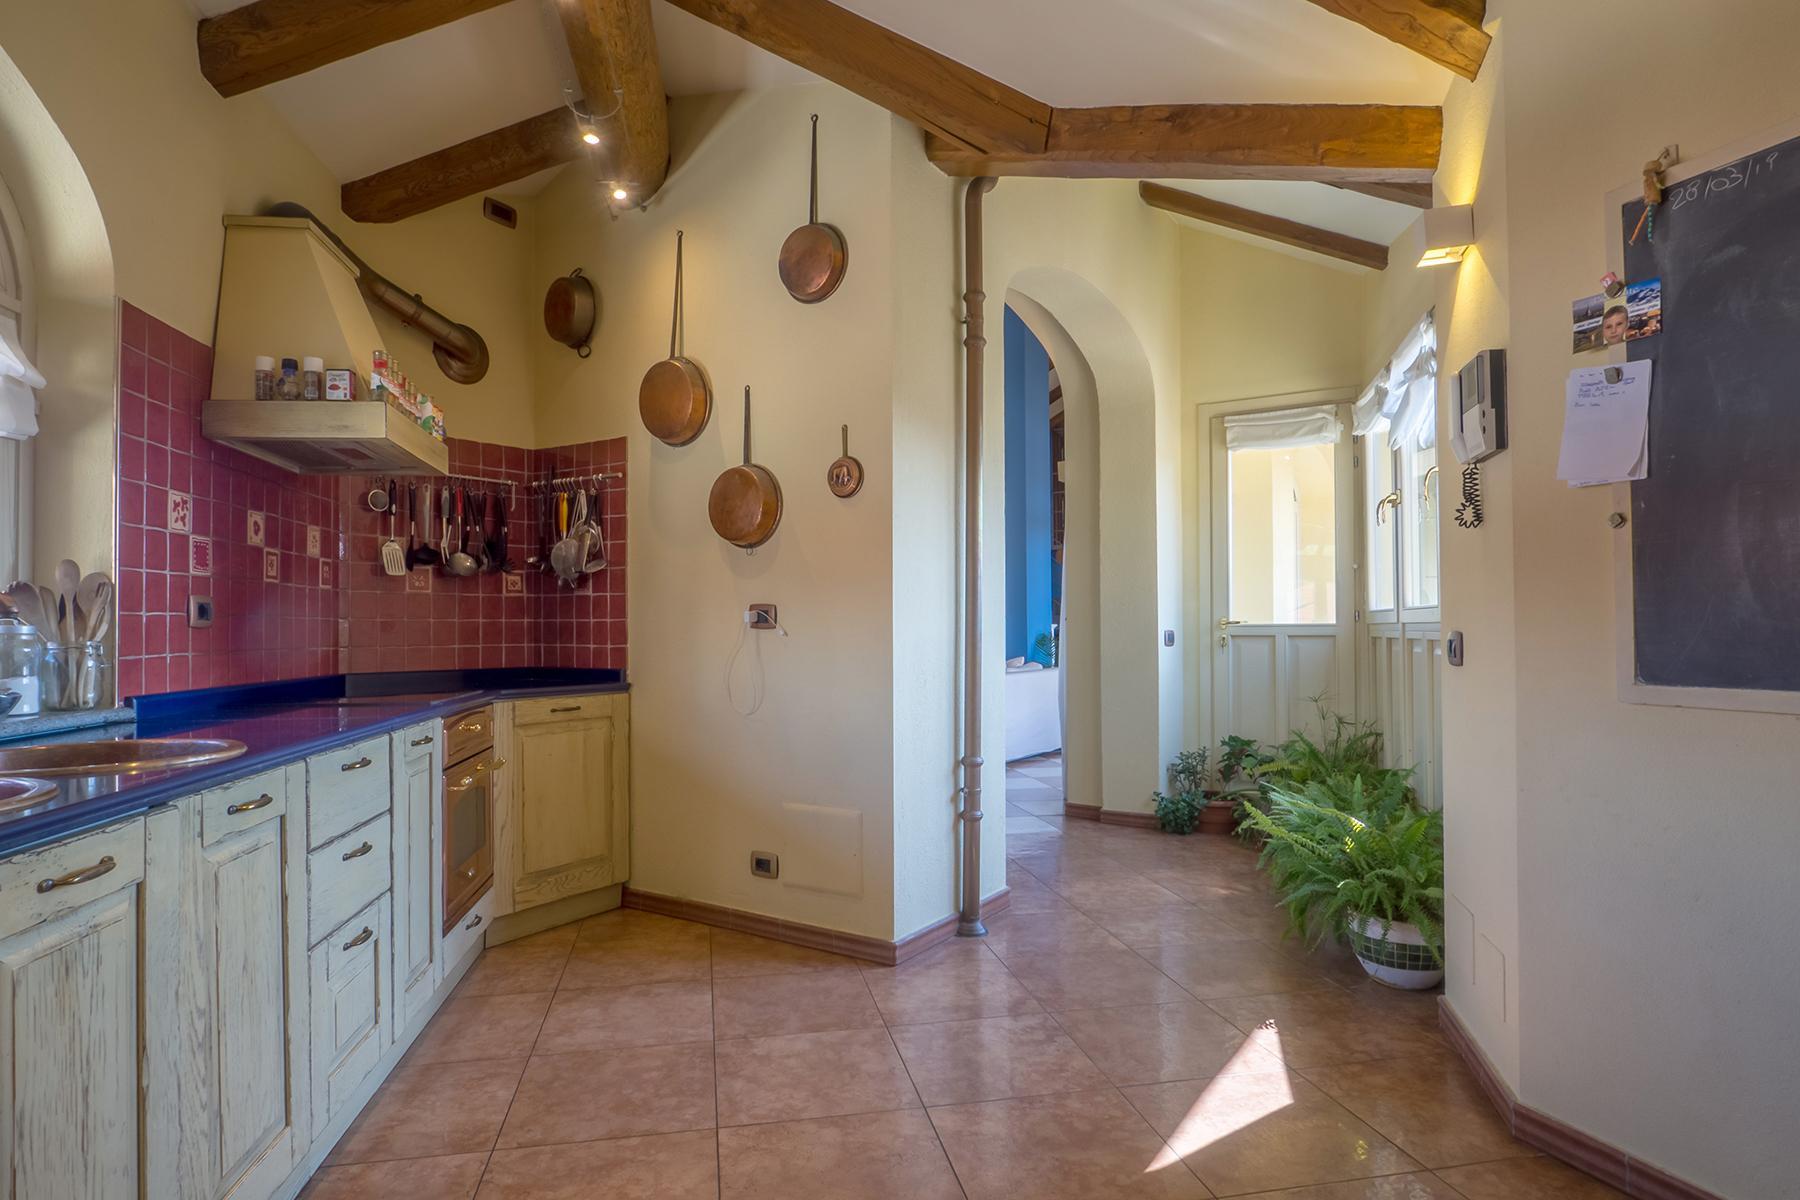 Elegant apartment in the Canavese region - 15